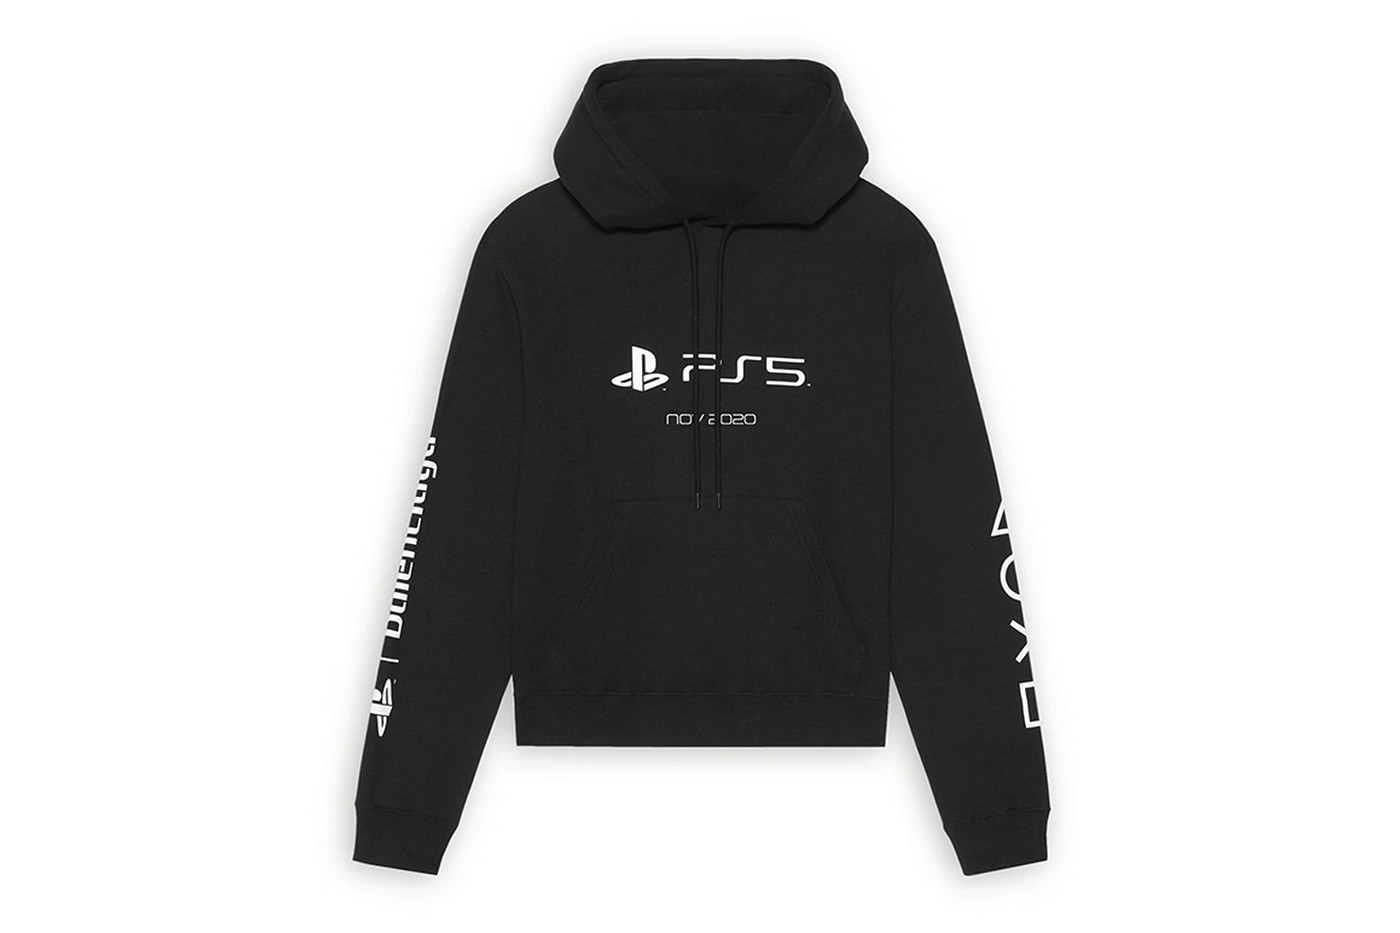 Balenciaga выпустил мерч для игровой консоли Sony PlayStation 5 (фото 5)